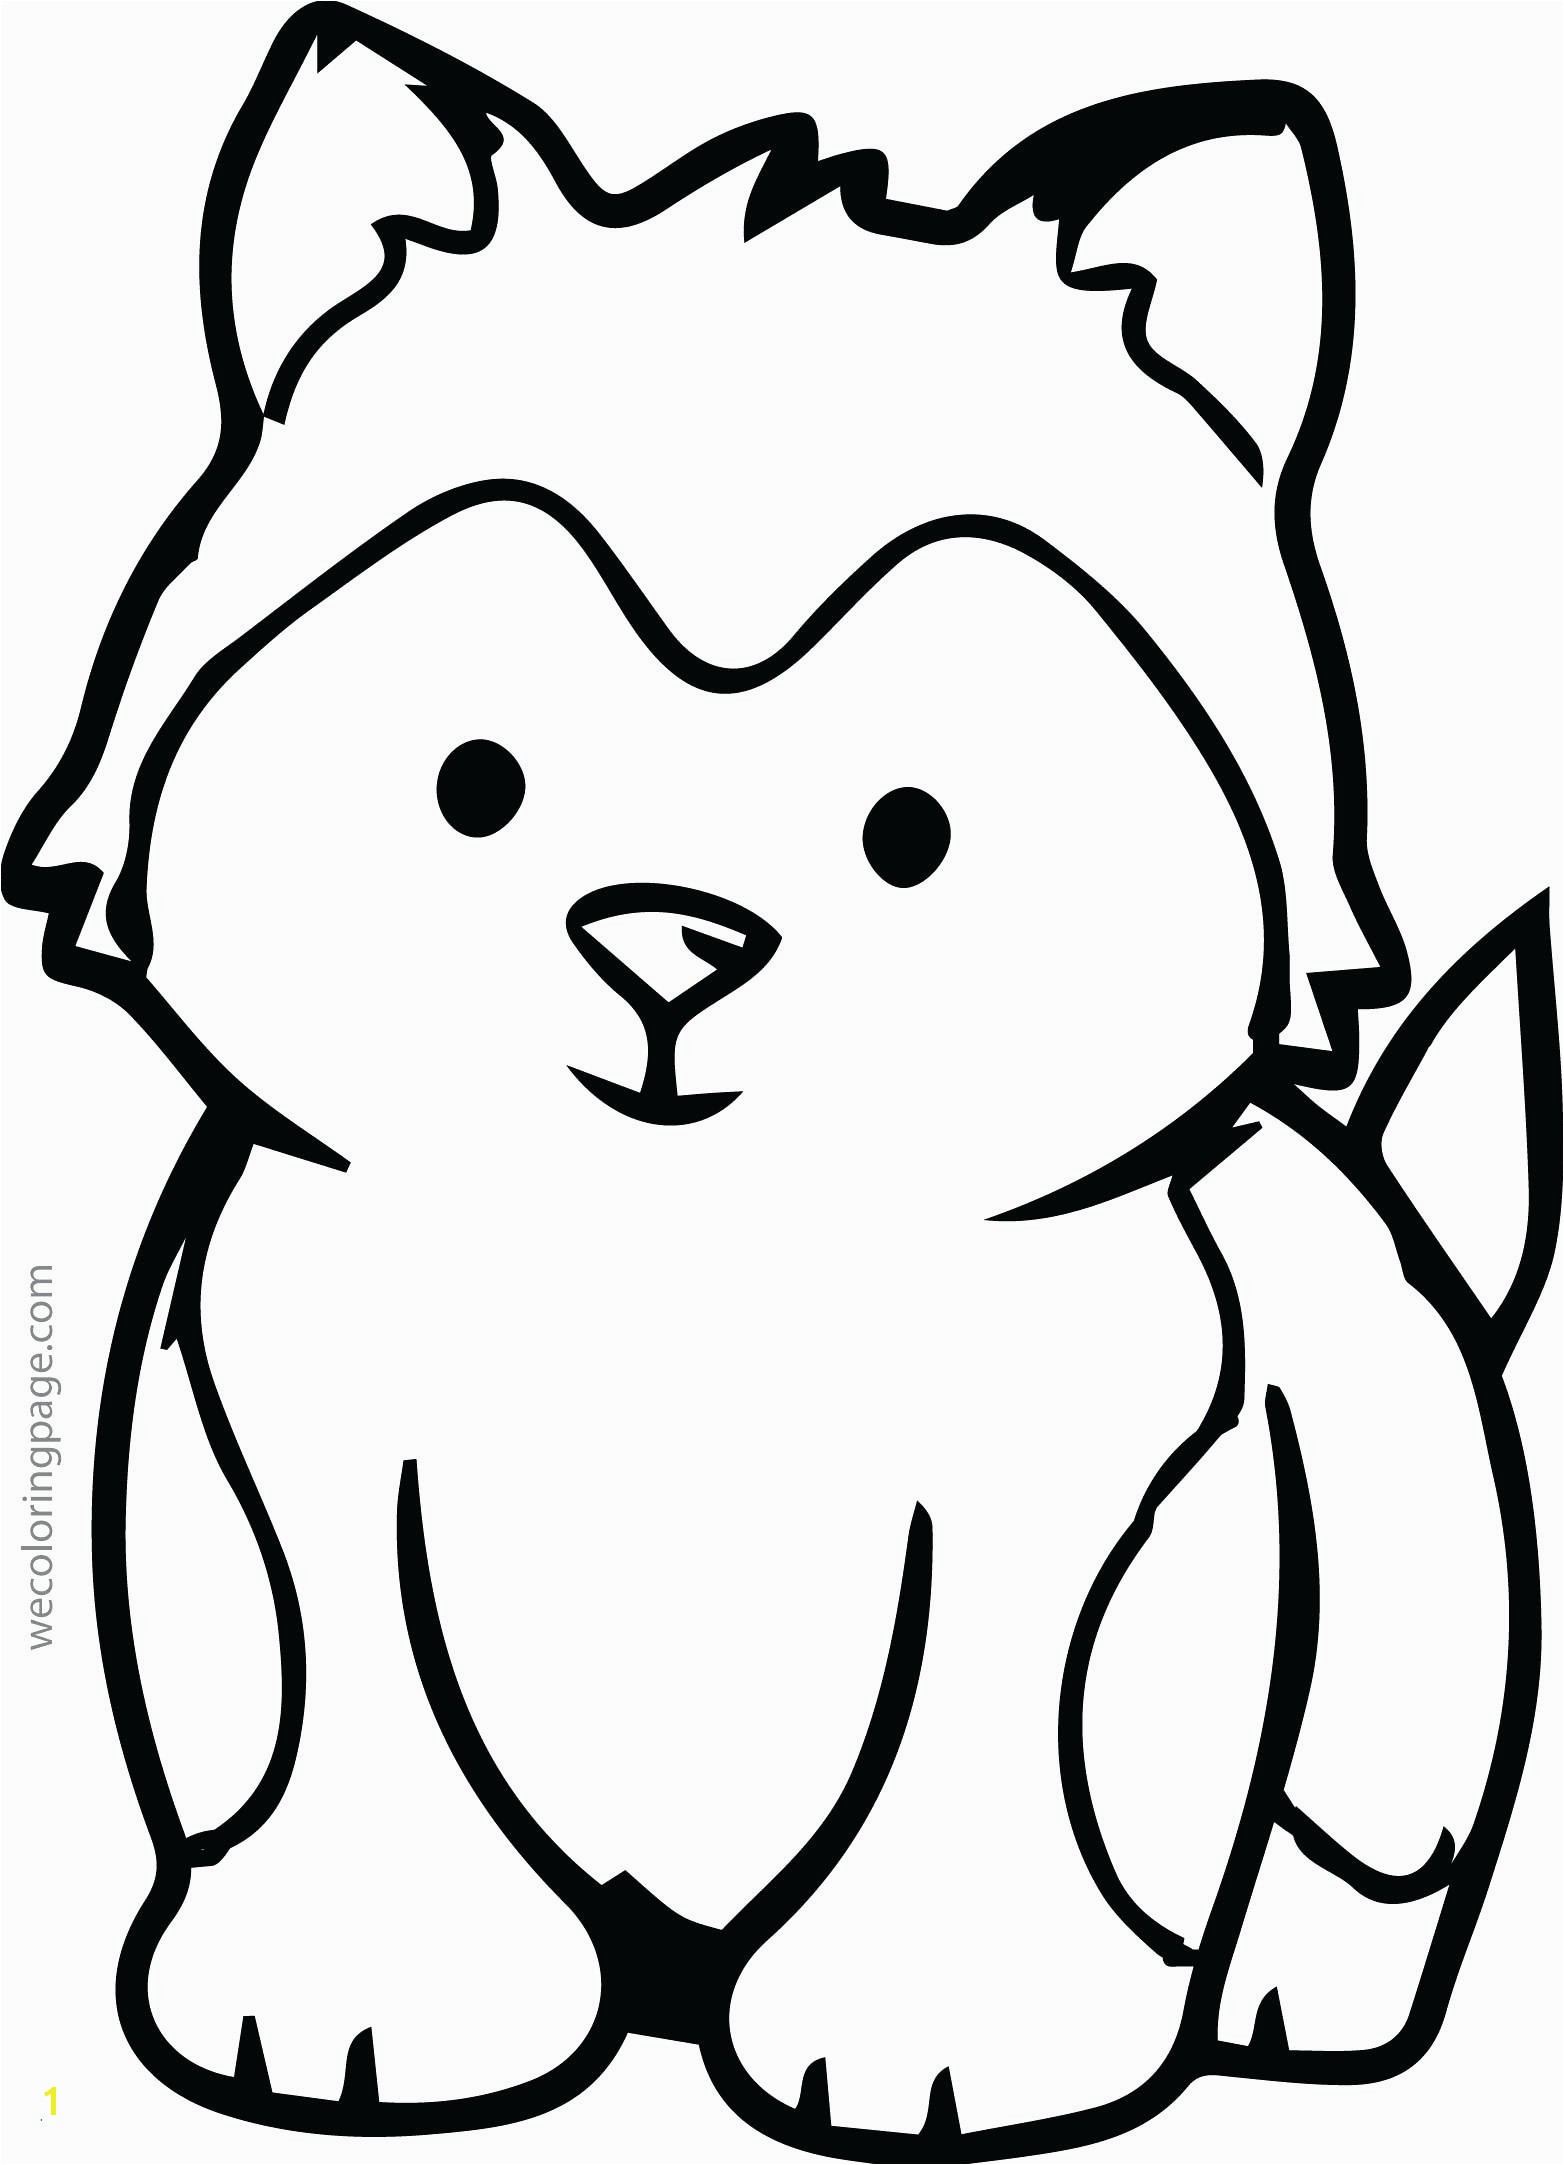 Blank Animal to Color Fresh Animal Coloring Pages Elegant Husky Coloring 0d Free Coloring Pages